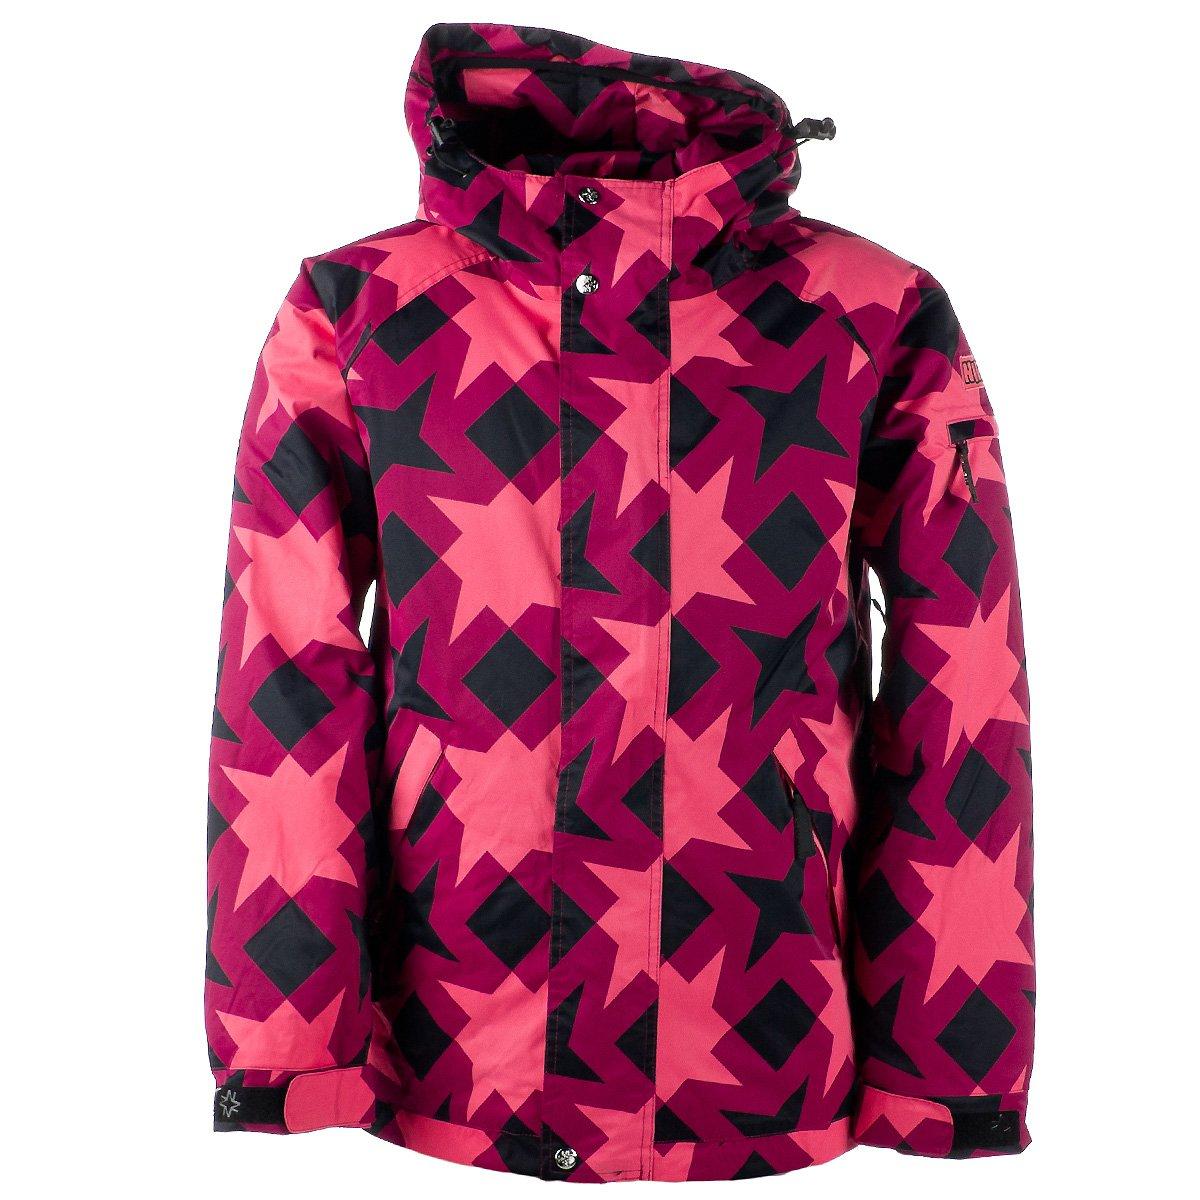 Damen Snowboard Jacke Nikita Lapland Jacket Women online kaufen